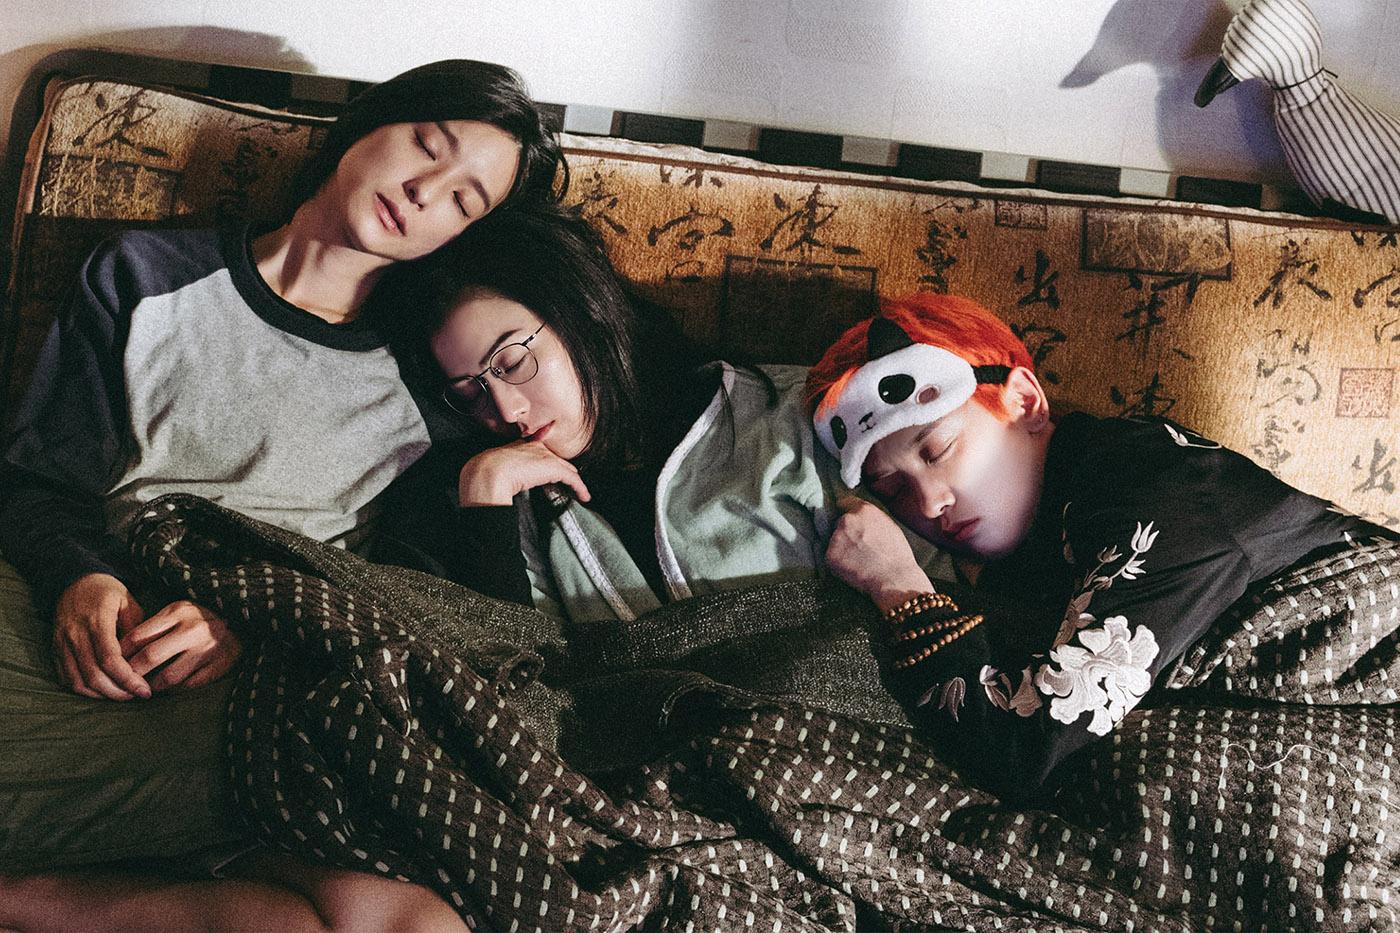 Fagara Filmmaker Heiward Mak on Gender, Sexuality and How Hong Kong Film is changing